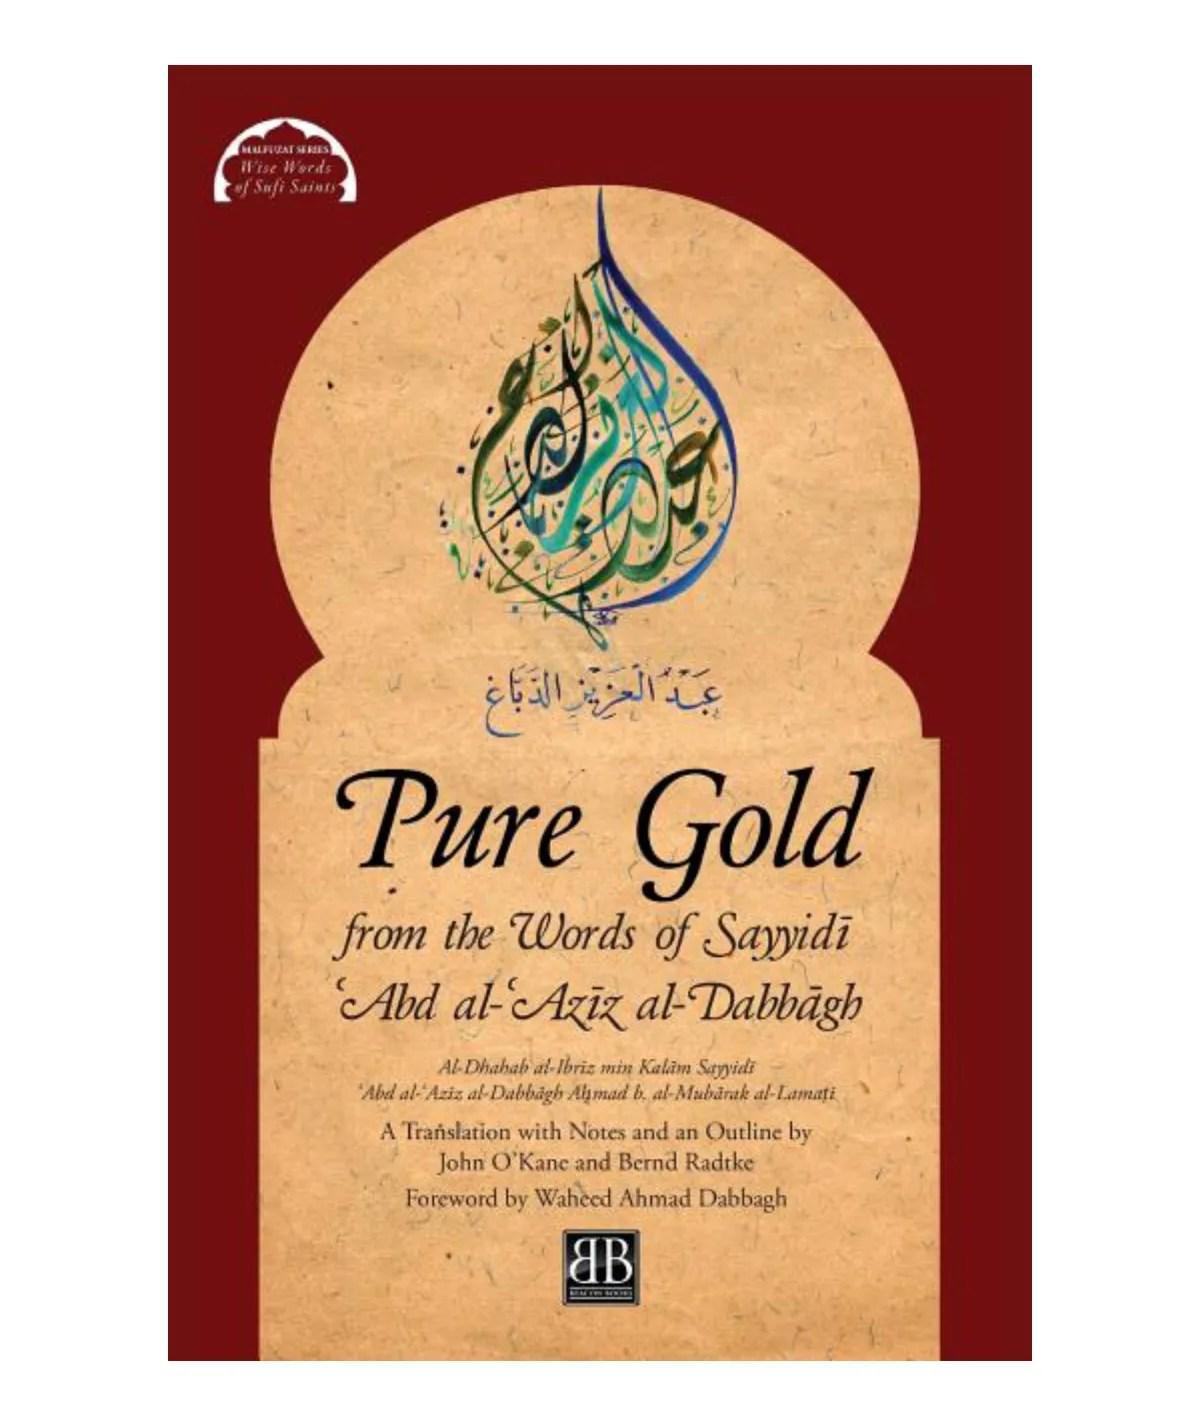 Pure Gold from the Words of Sayyidī ʿAbd al-ʿAzīz al-Dabbāgh: Al-Dhahab al-Ibrīz min Kalām Sayyidī ʿAbd a  ( Malfuzat  #1  ): Al-Lamaṭī, Aḥmad B Al-Mub&#257rak | O'Kane, John | Radtke, Bernd